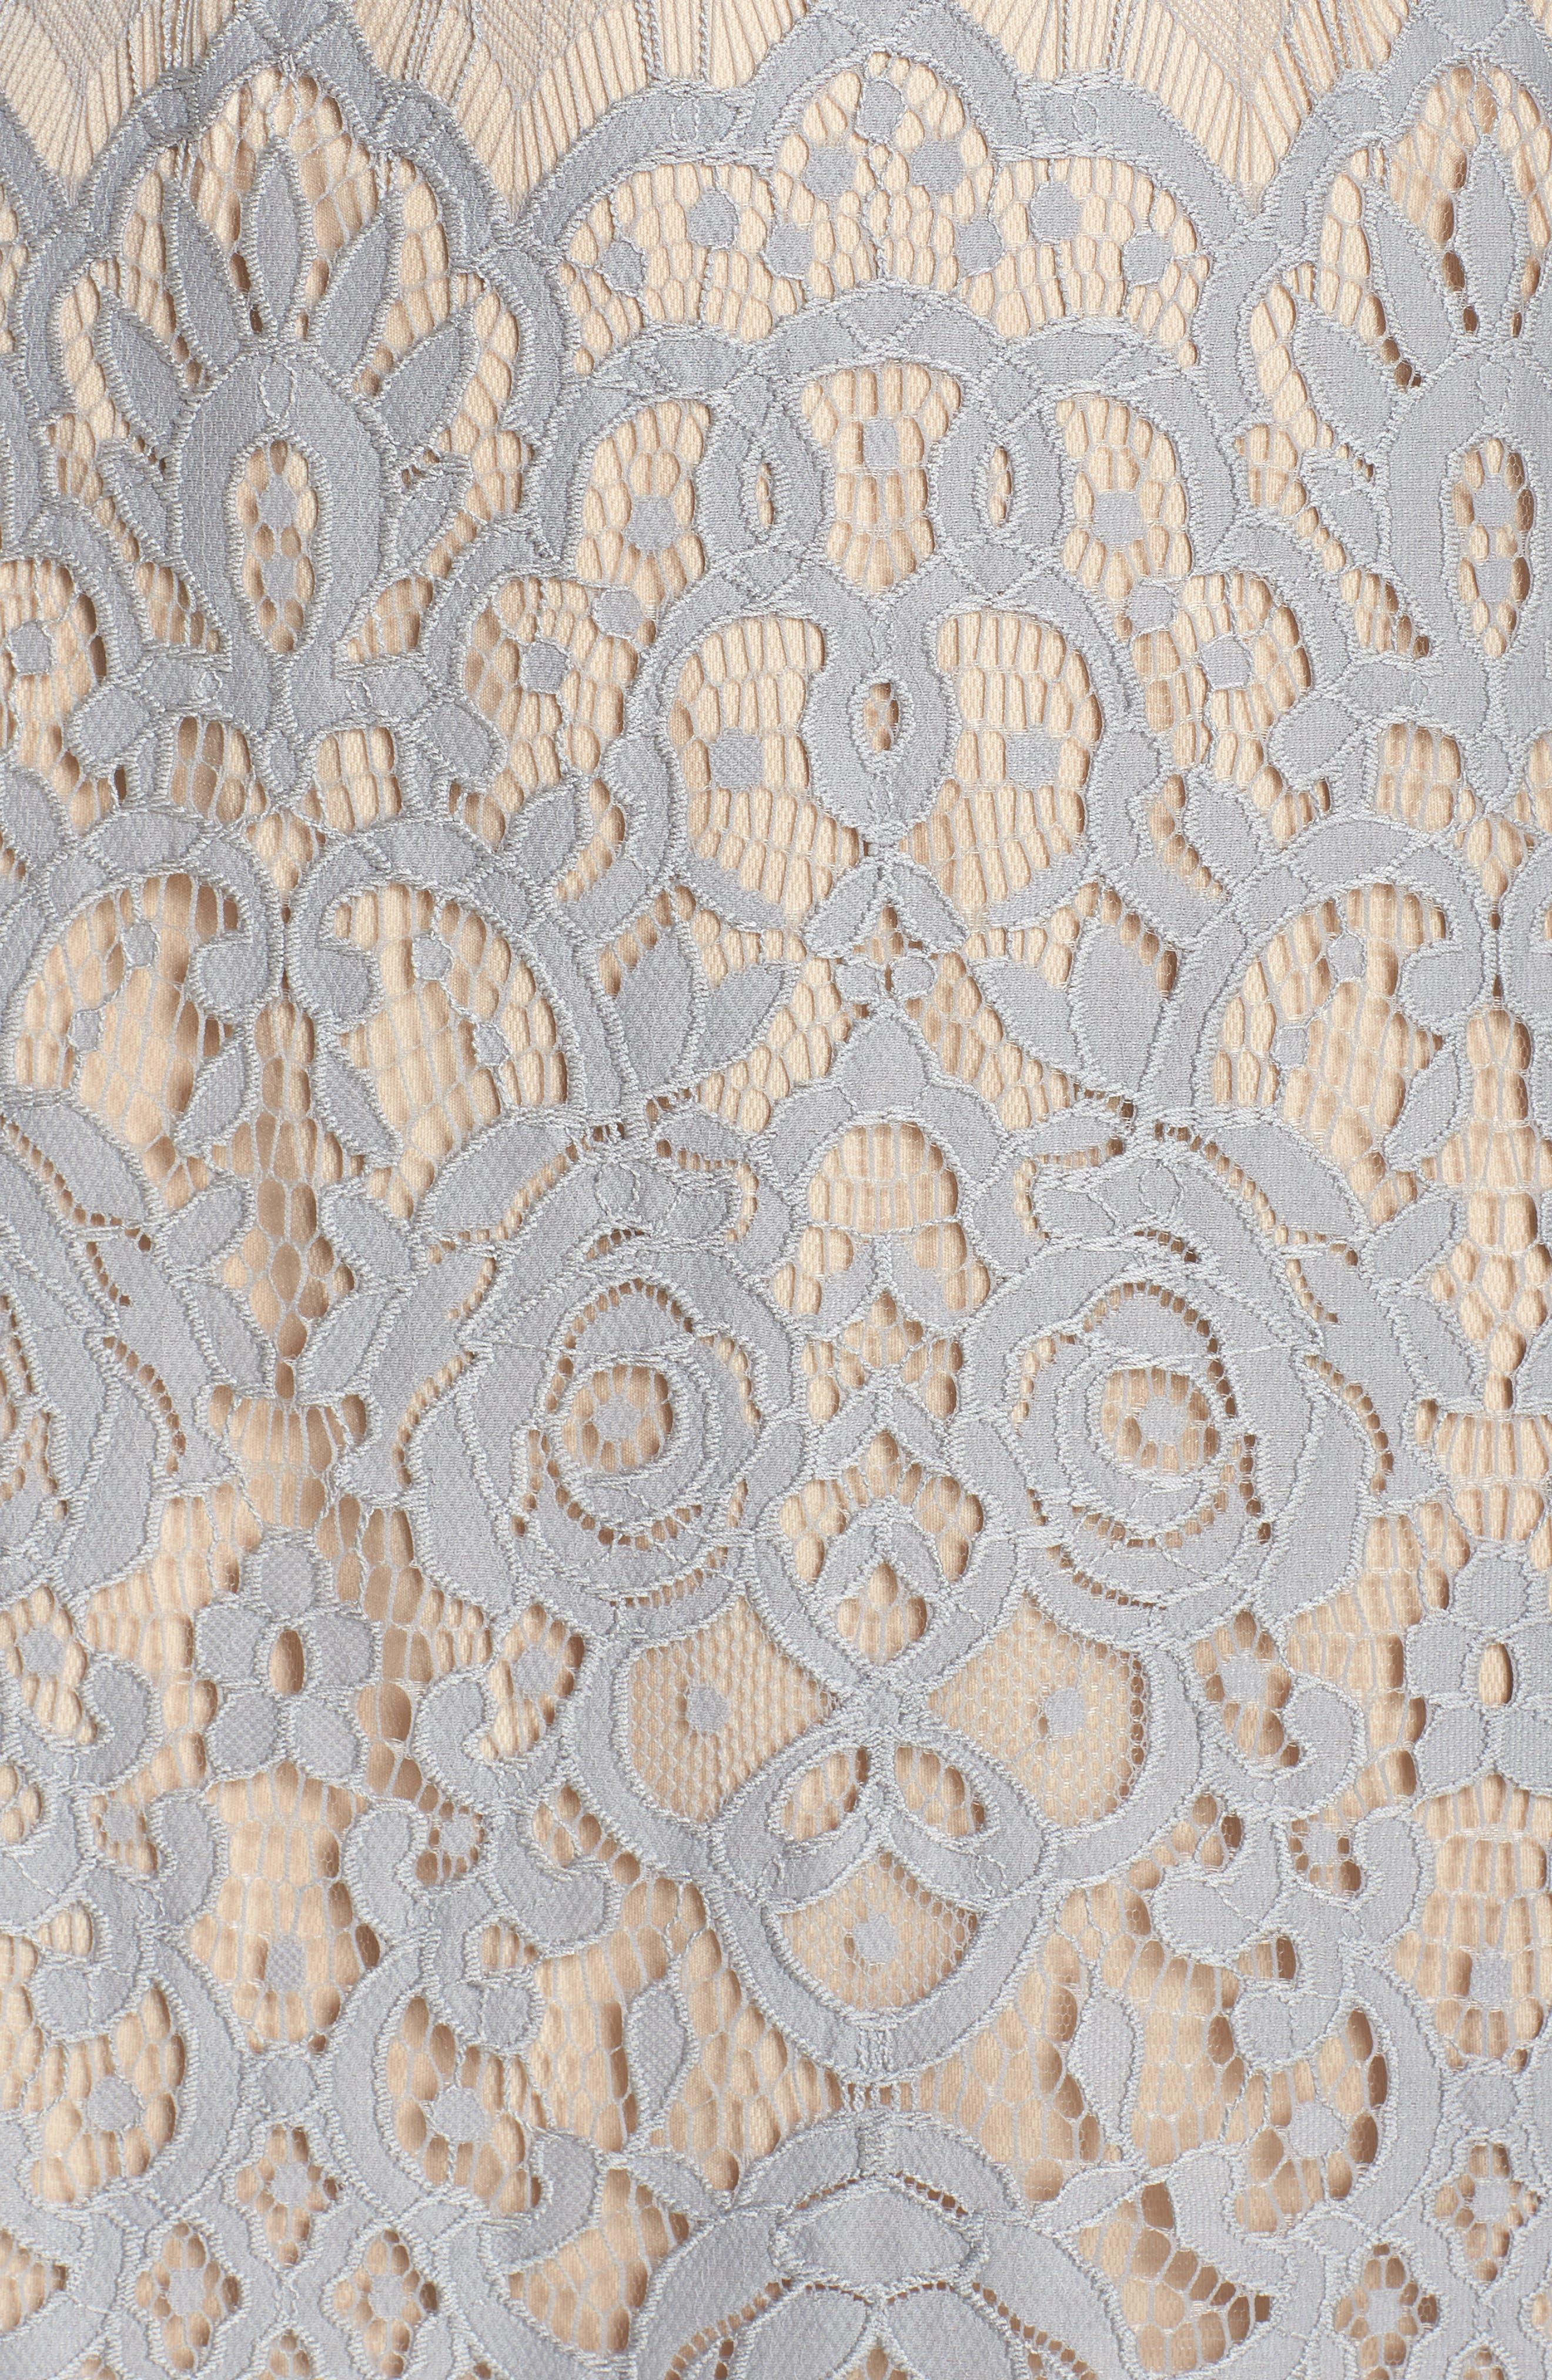 Lace Sheath Dress,                             Alternate thumbnail 5, color,                             Pewter/ Petal